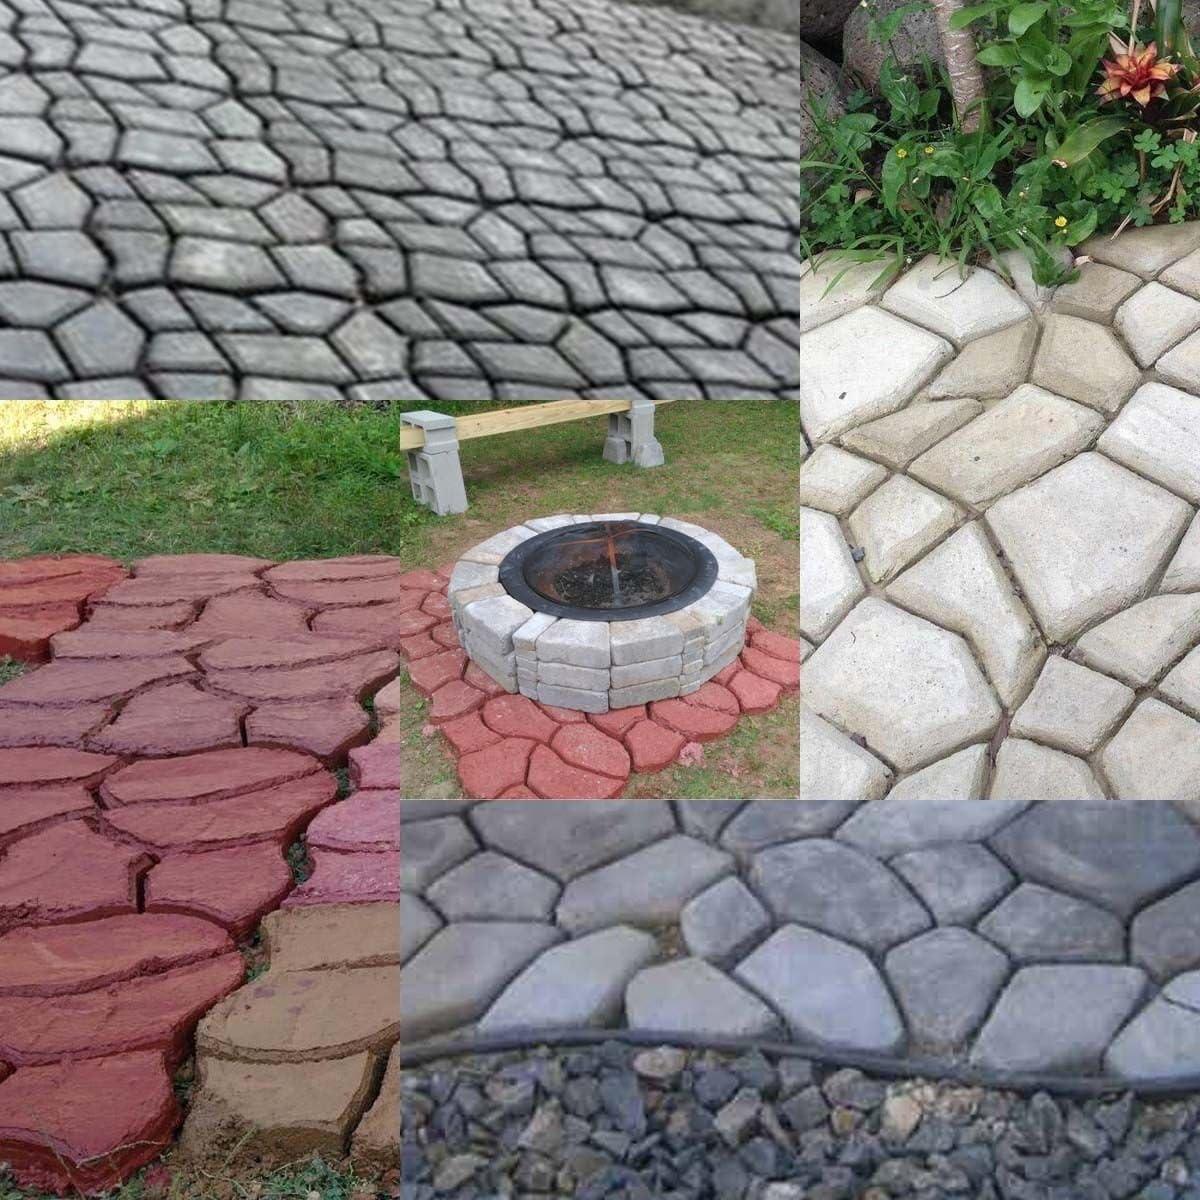 TC-Home 2pcs Pathmate Stone Mold Driveway Paving Brick Patio Mold Concrete Slabs Path Garden Walk Maker 43cm x 43cm